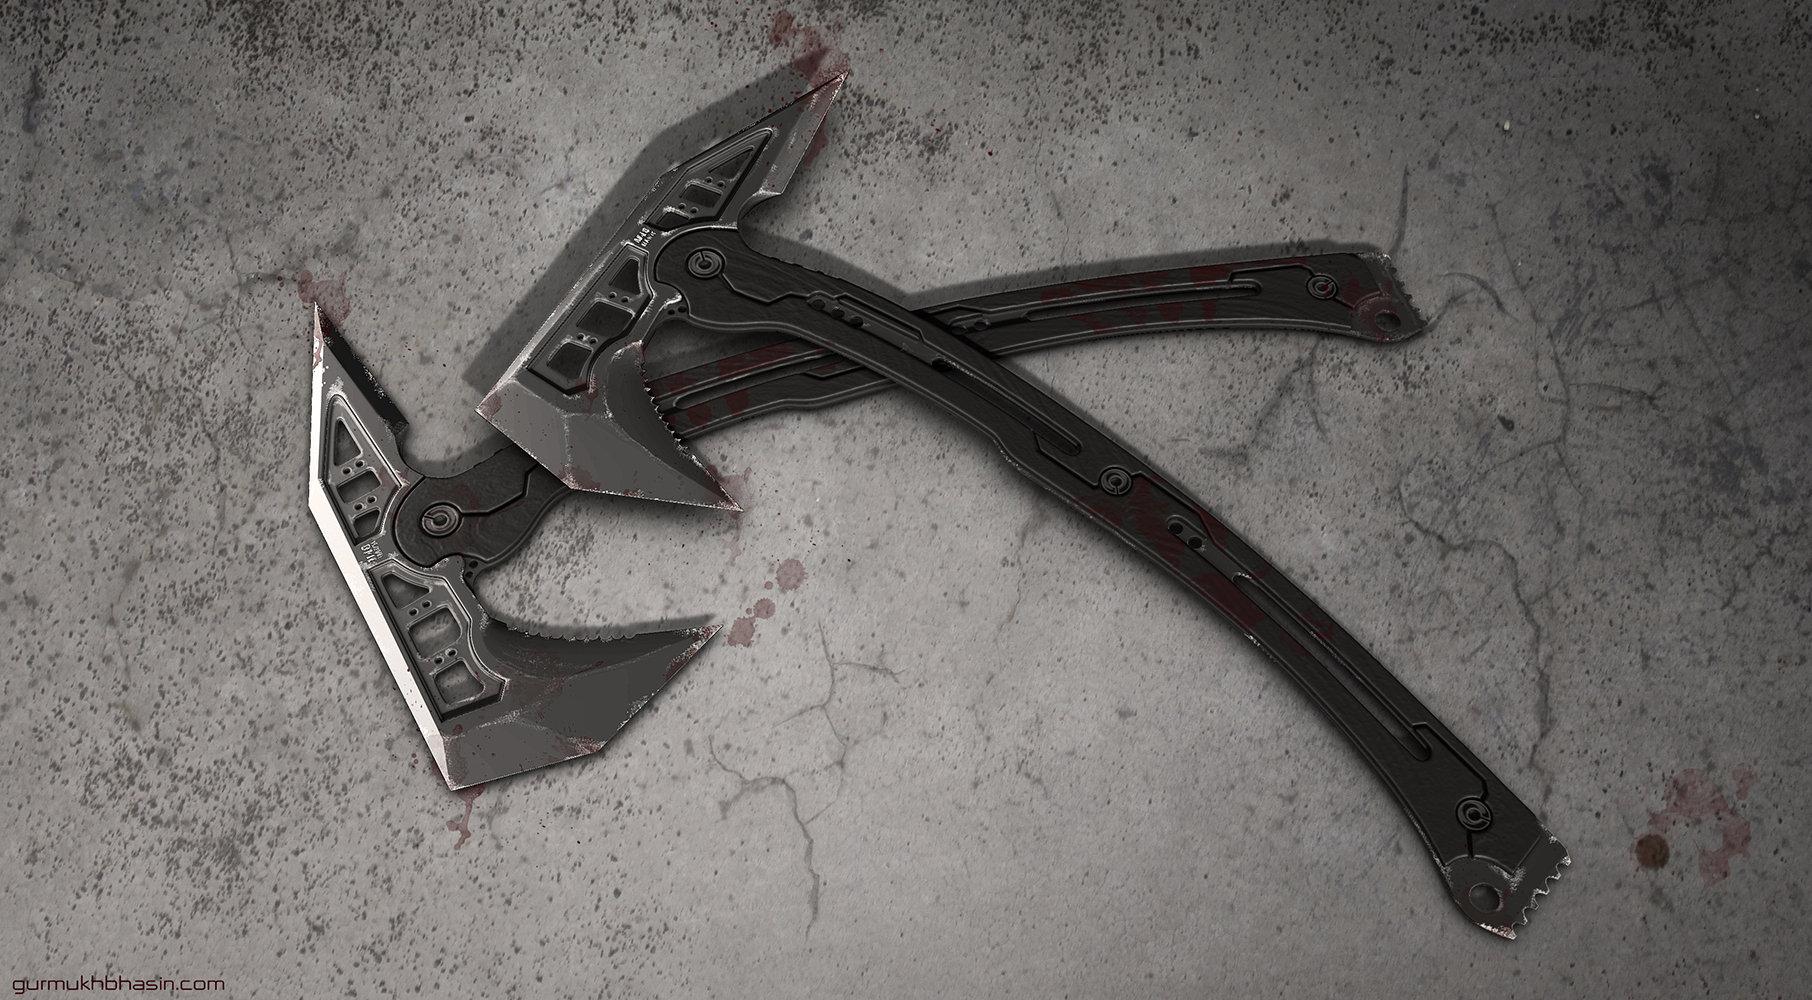 Gurmukh bhasin scifi tomahawk render half